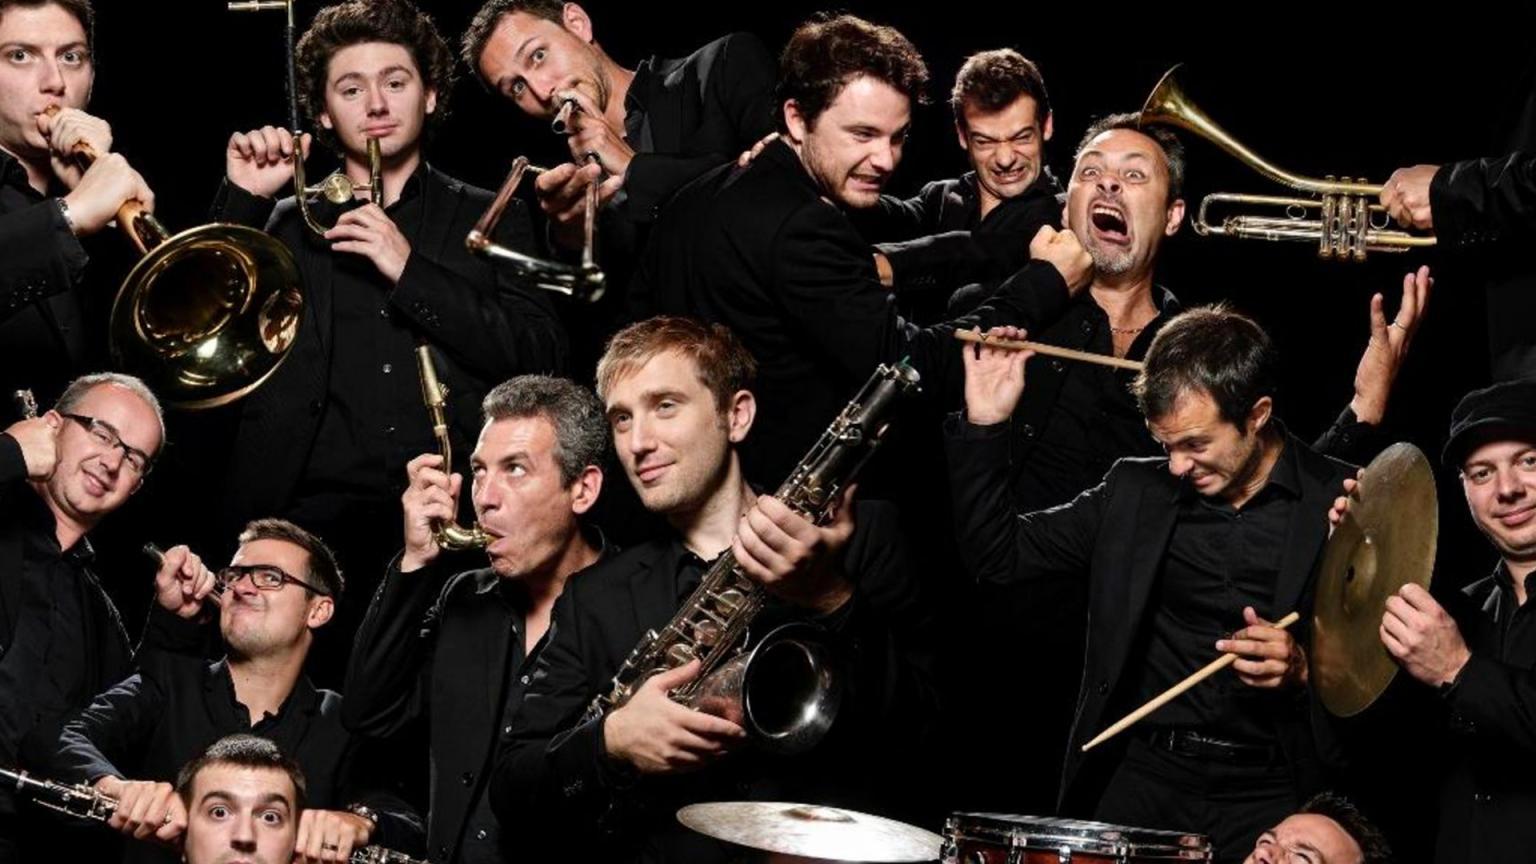 The Amazing Keystone Big Band